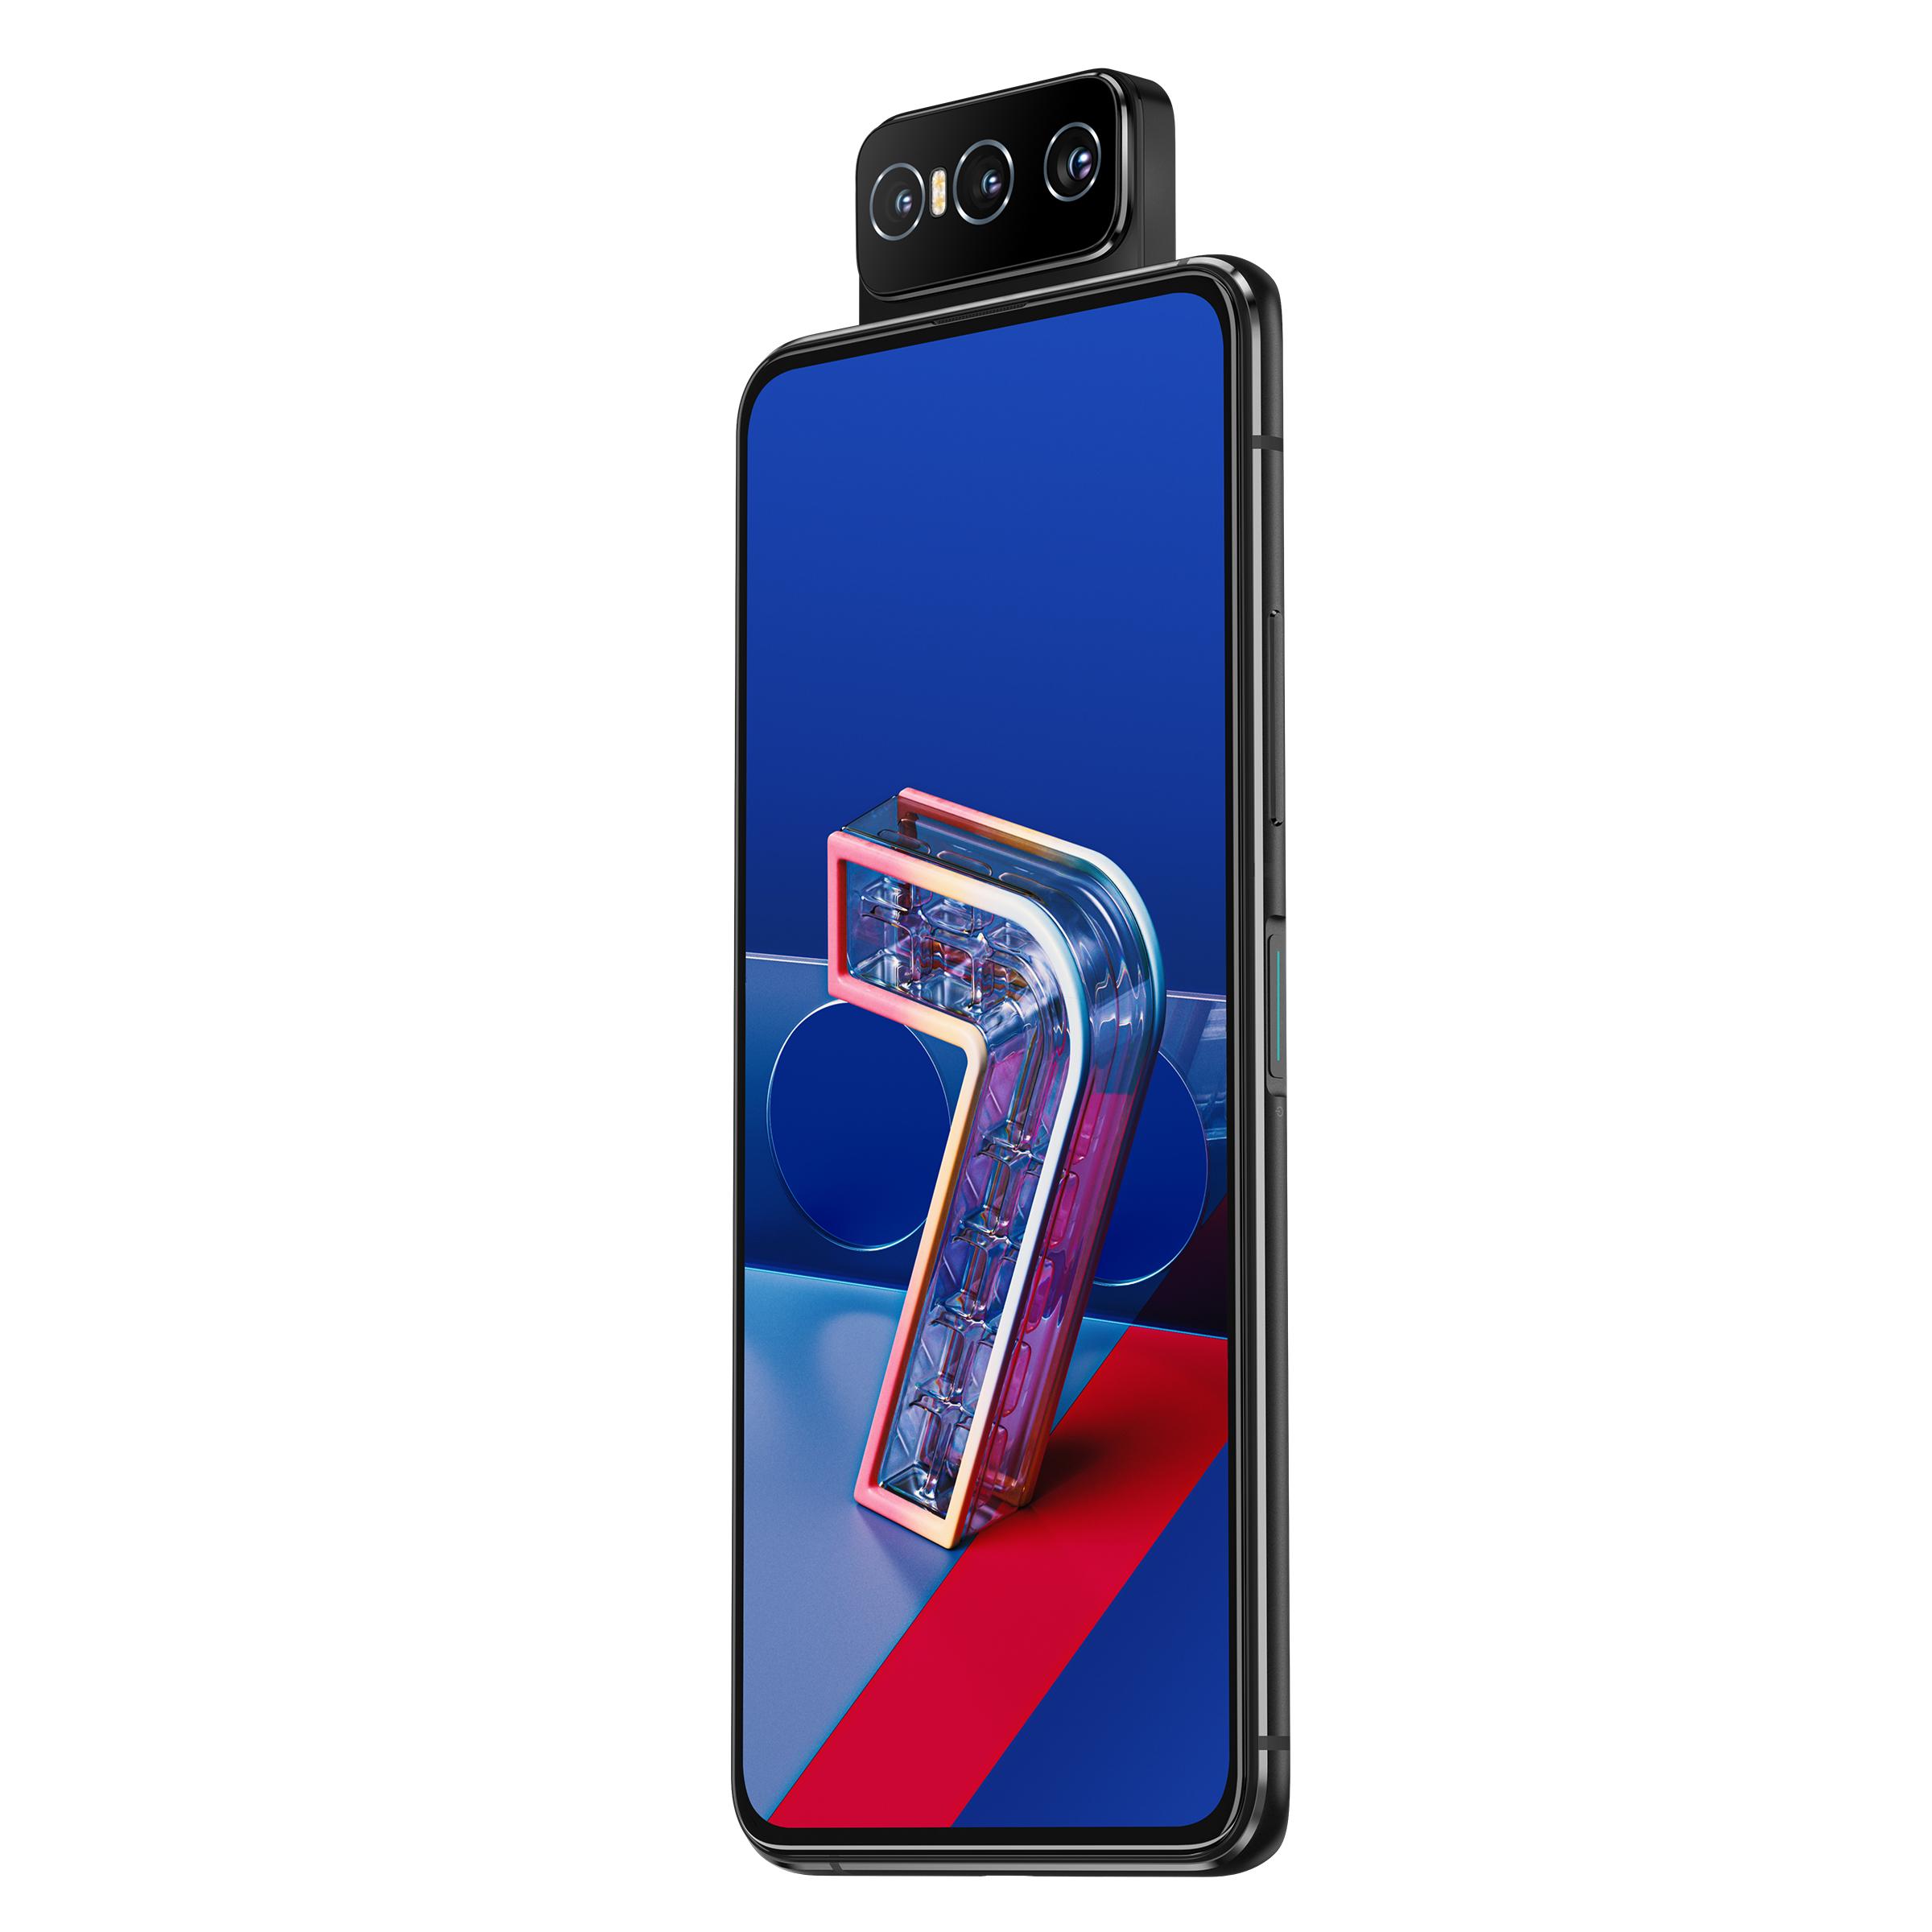 "Smartphone 6.67"" Asus ZenFone 7 - Full HD+, AMOLED 90 Hz NanoEdge, SnapDragon 865, 8 Go de RAM, 128 Go, 5G, 64 Mpix"